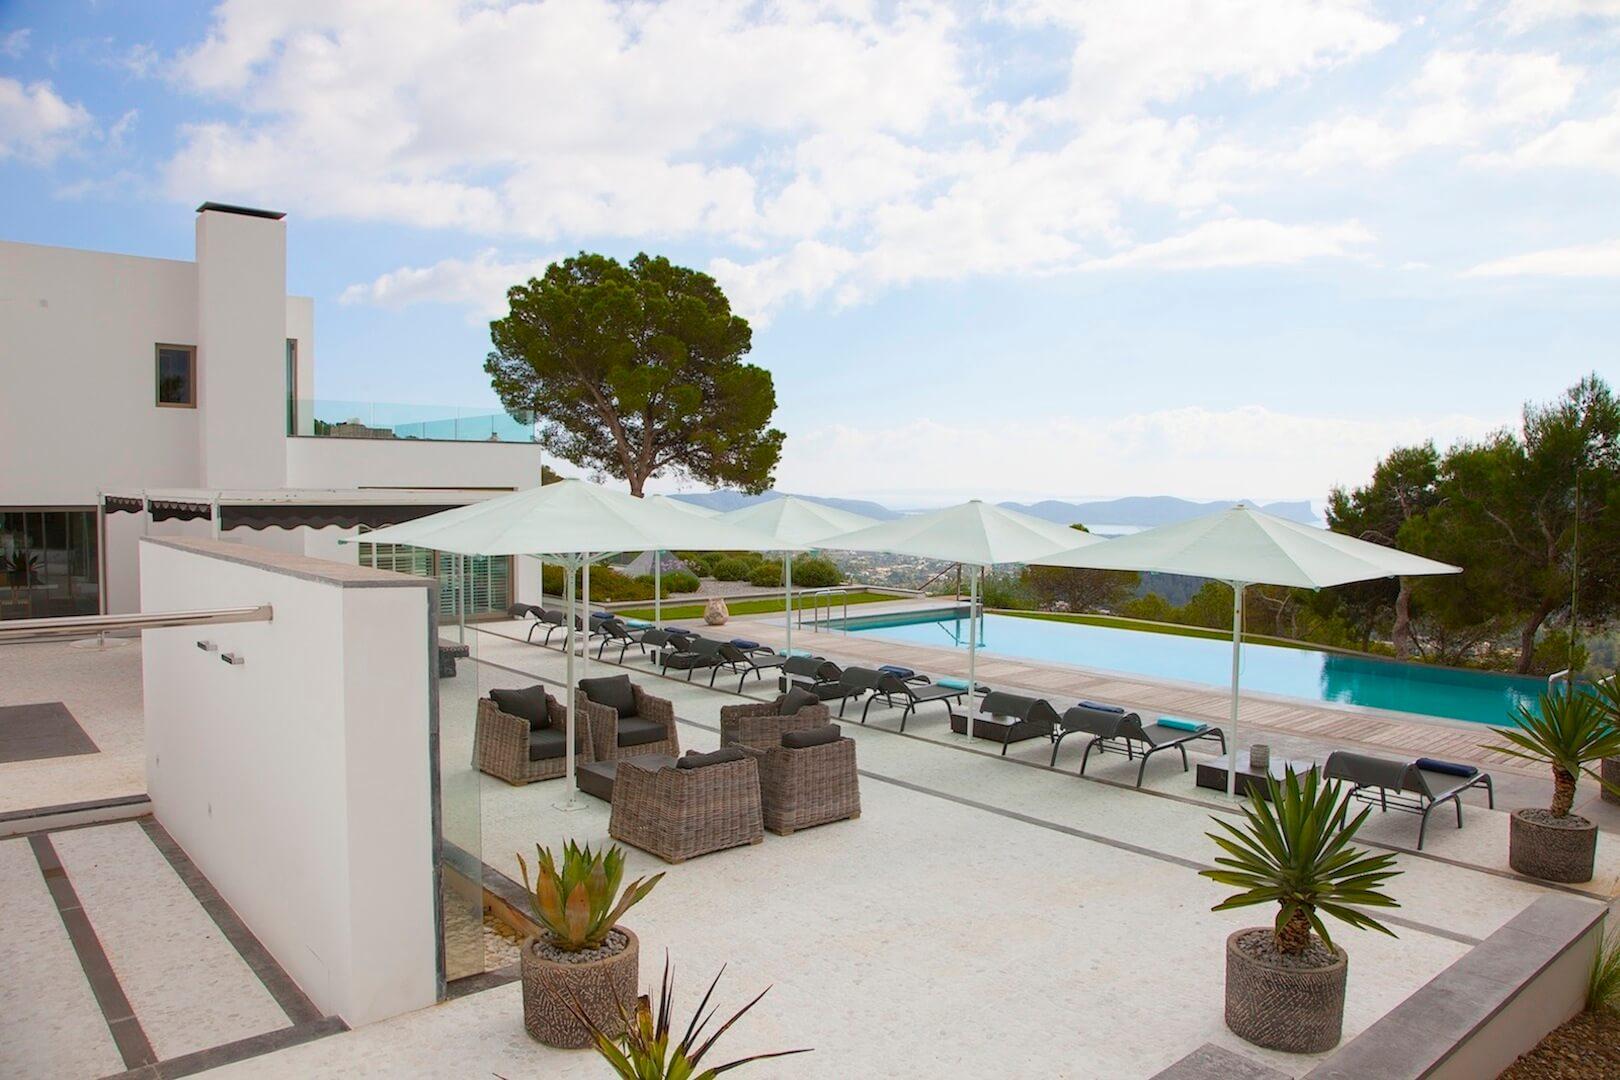 Holiday villa in ibiza with spectacular views over salinas - Ibiza house renting ...